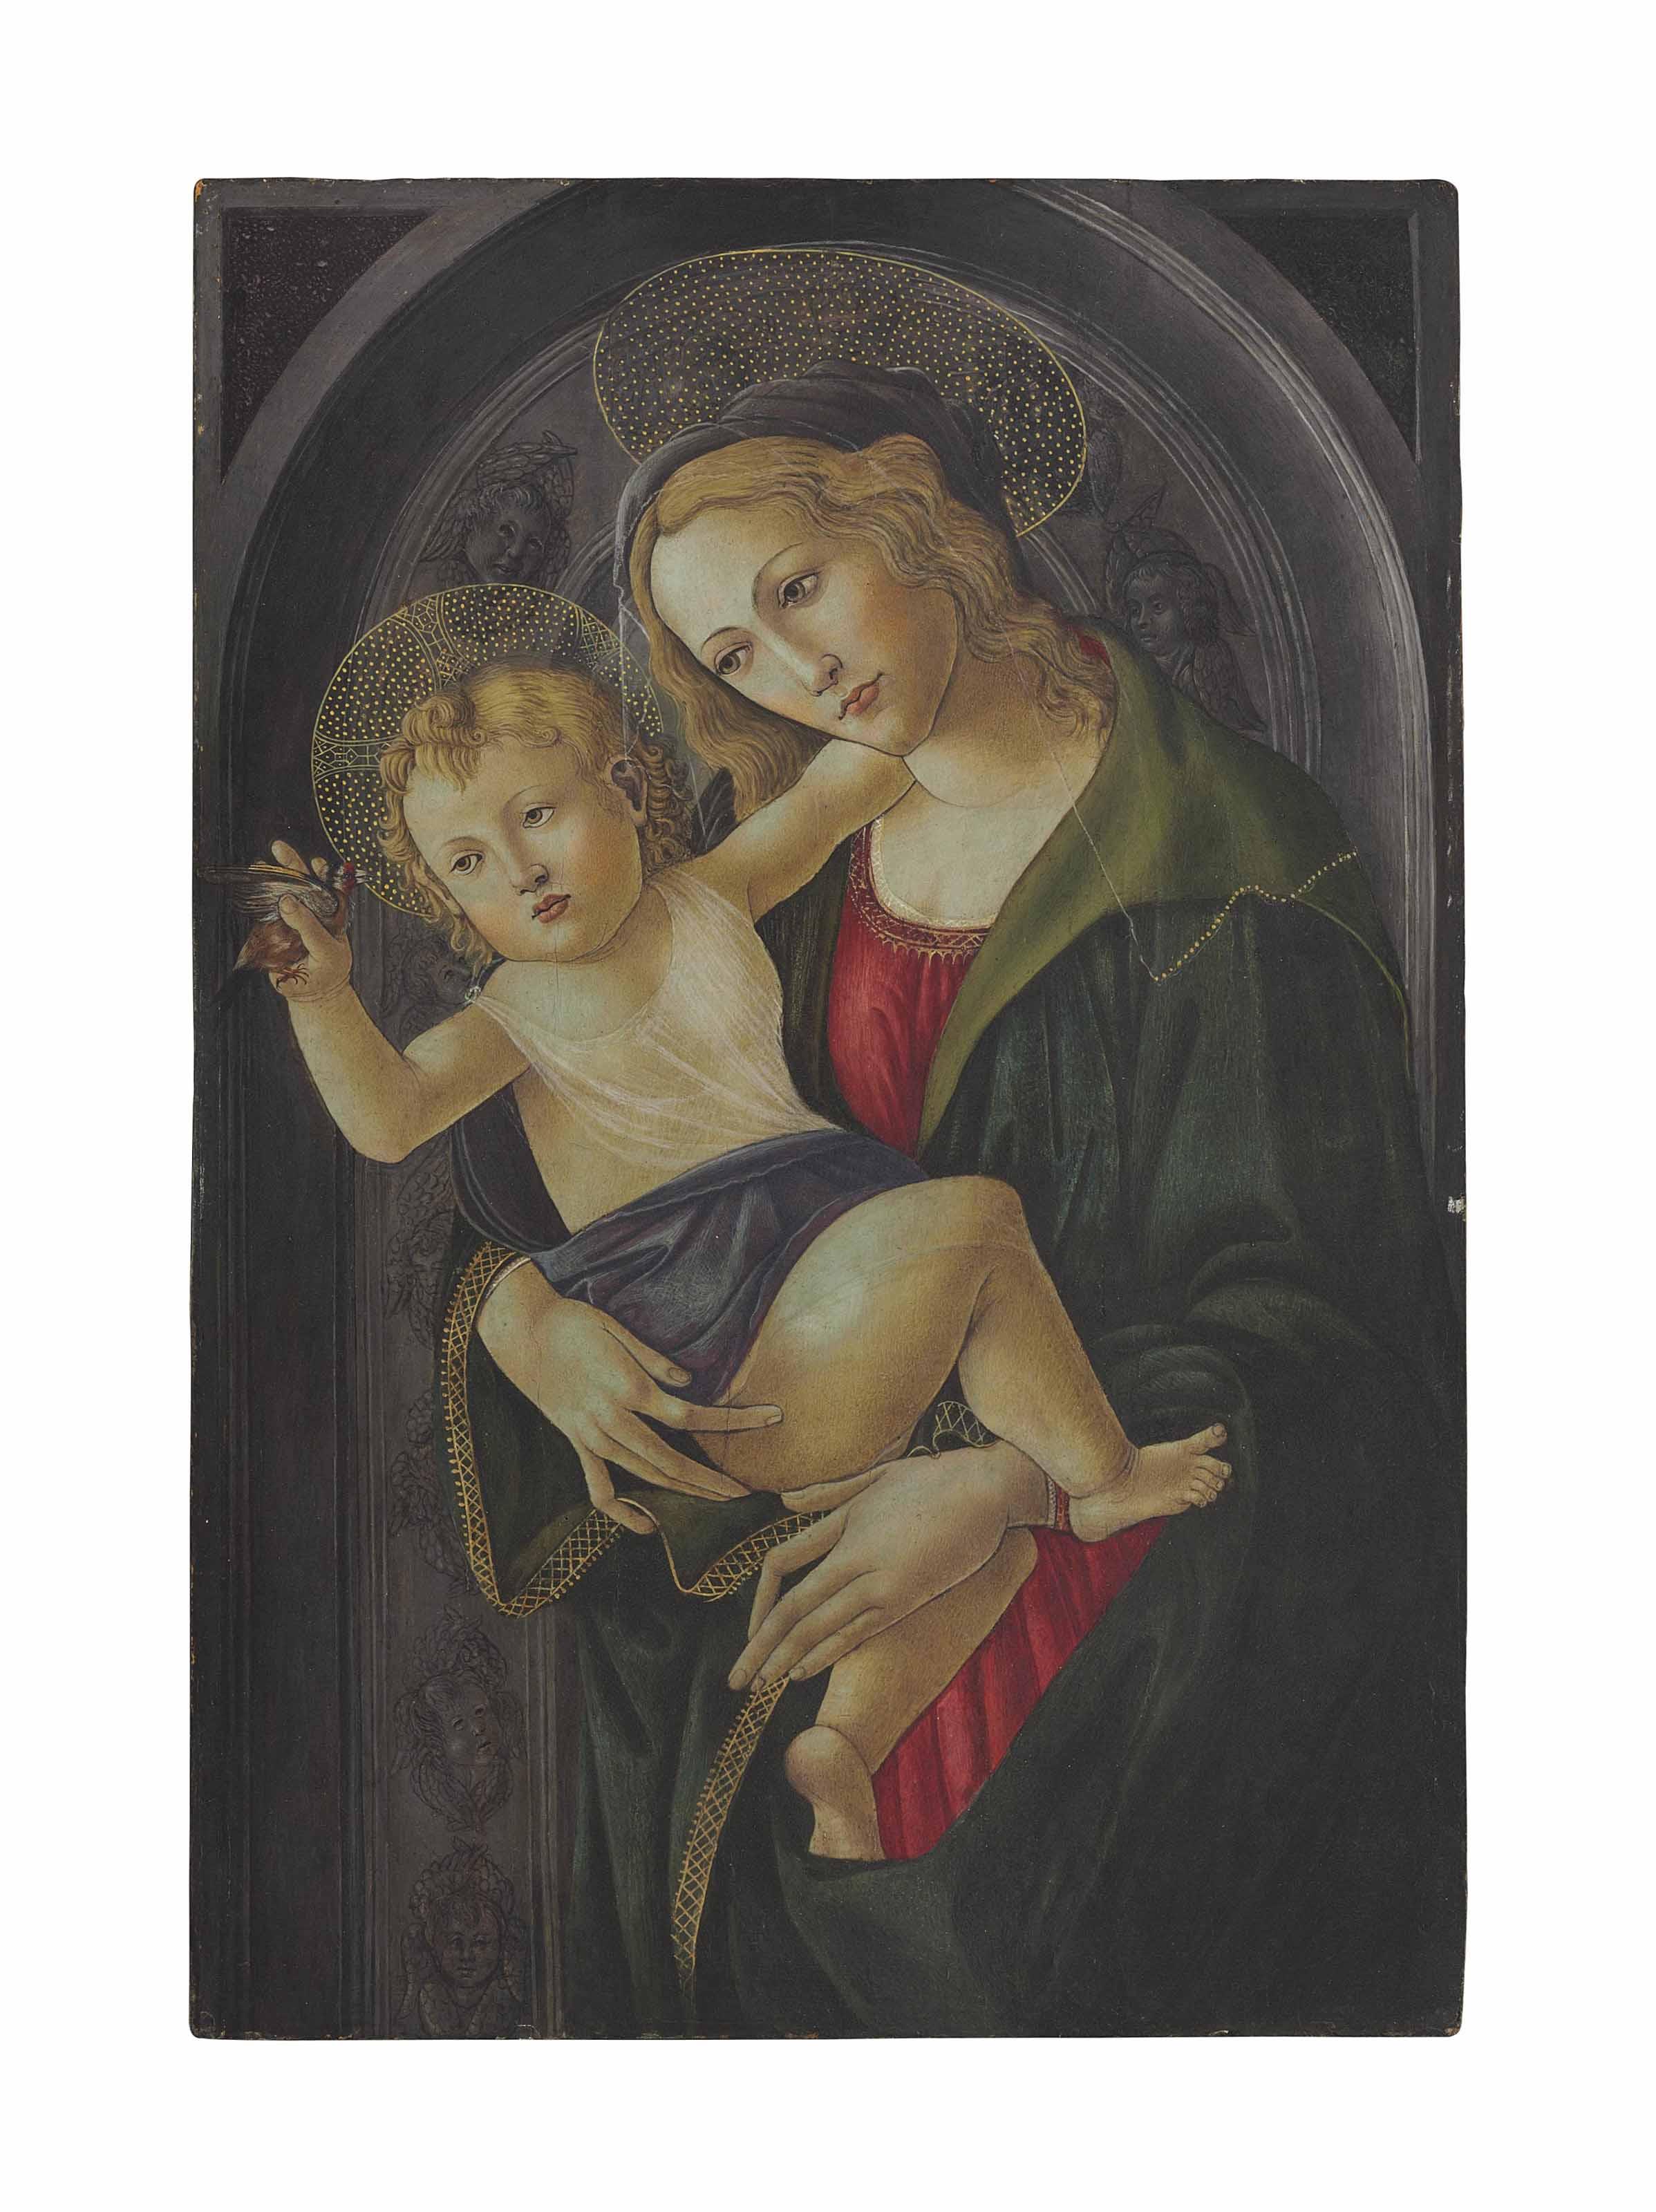 Studio of Alessandro Filipepi, called Sandro Botticelli (Florence 1444/45-1510)